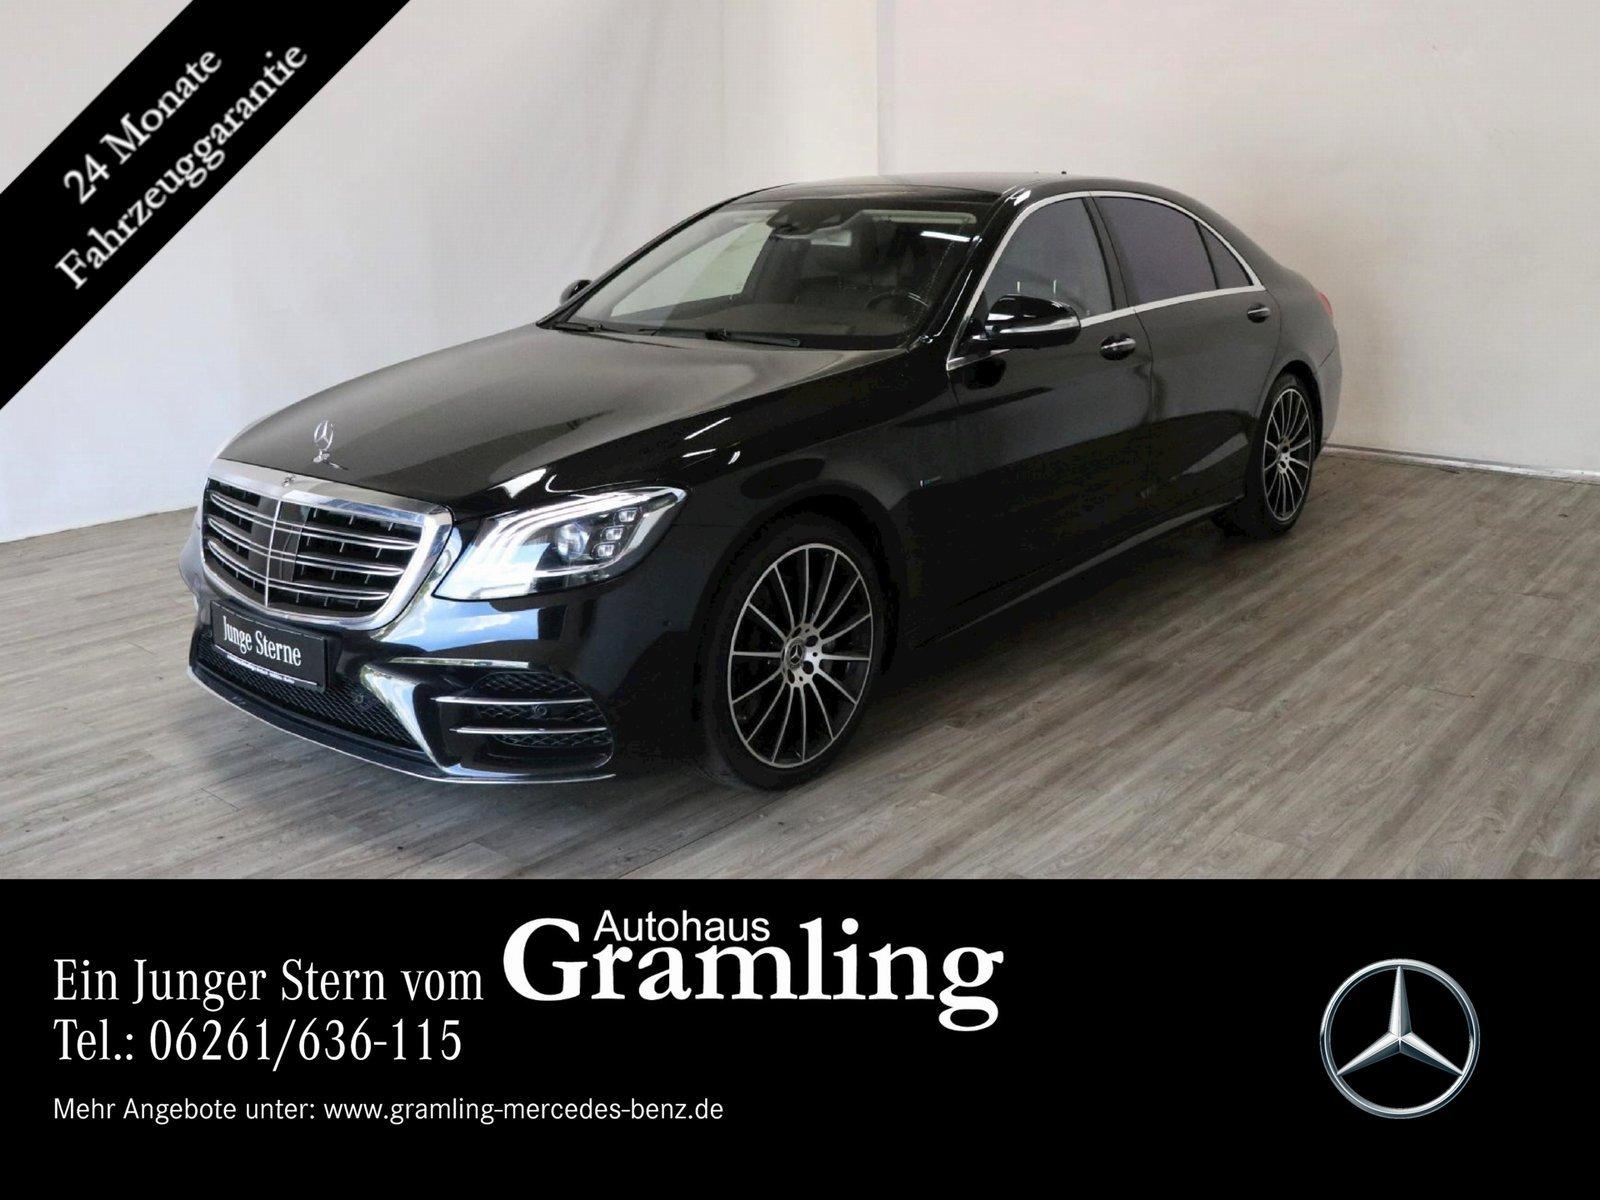 Mercedes-Benz S 560 e L*AMG Plus*Pano*Distr*360°*HUD*Sitzklima, Jahr 2019, Hybrid